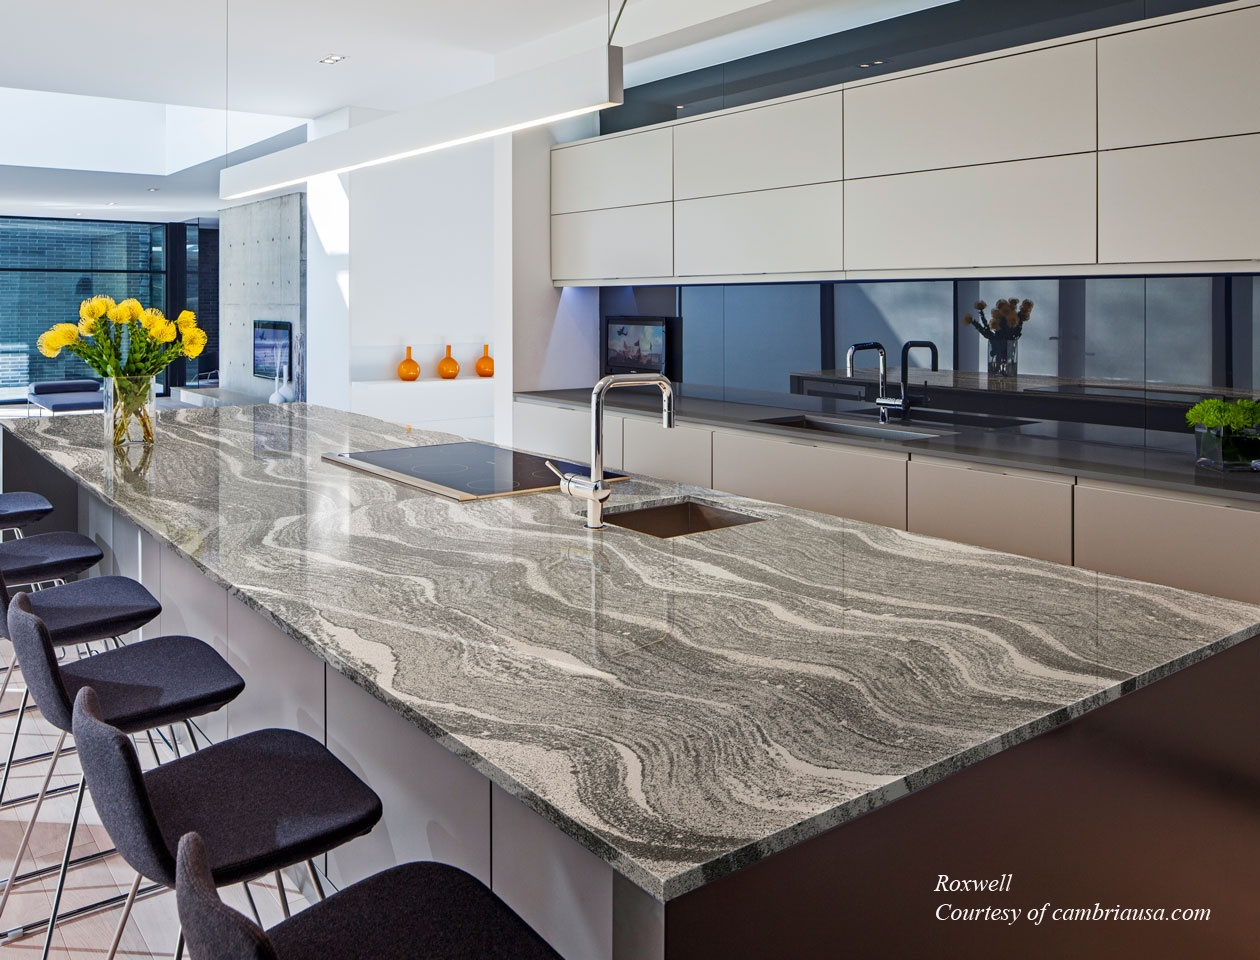 roxwell_kitchen_2.jpg